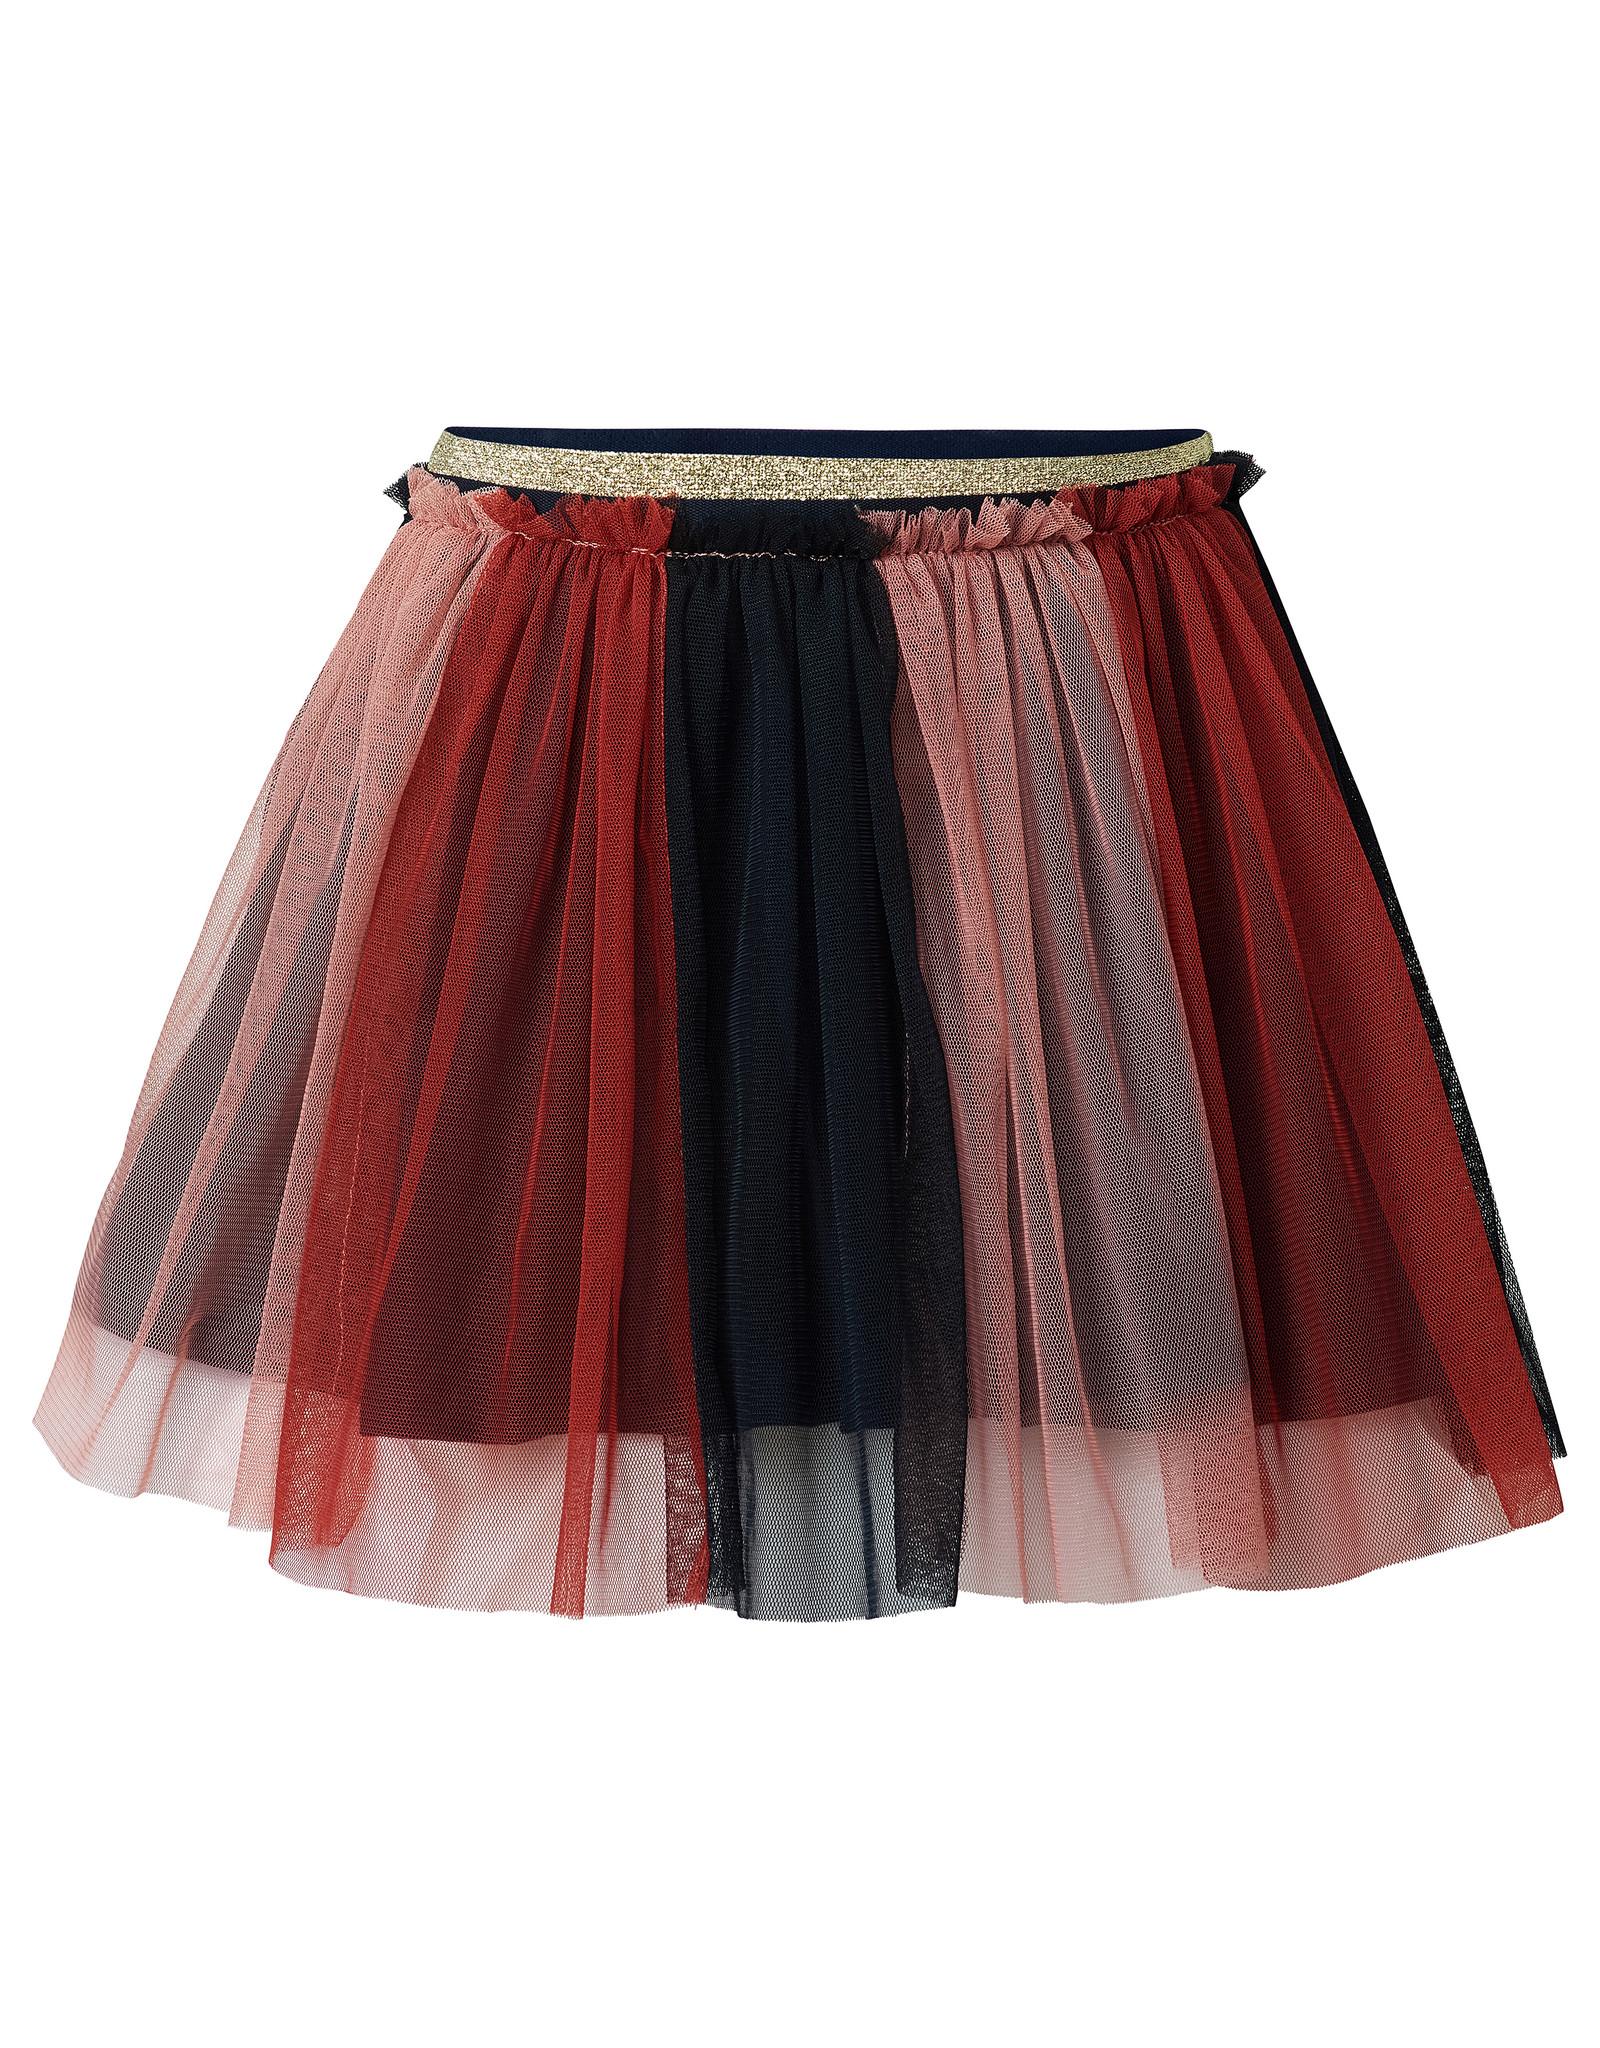 Noppies G Skirt Glencoe, Ancient Pink